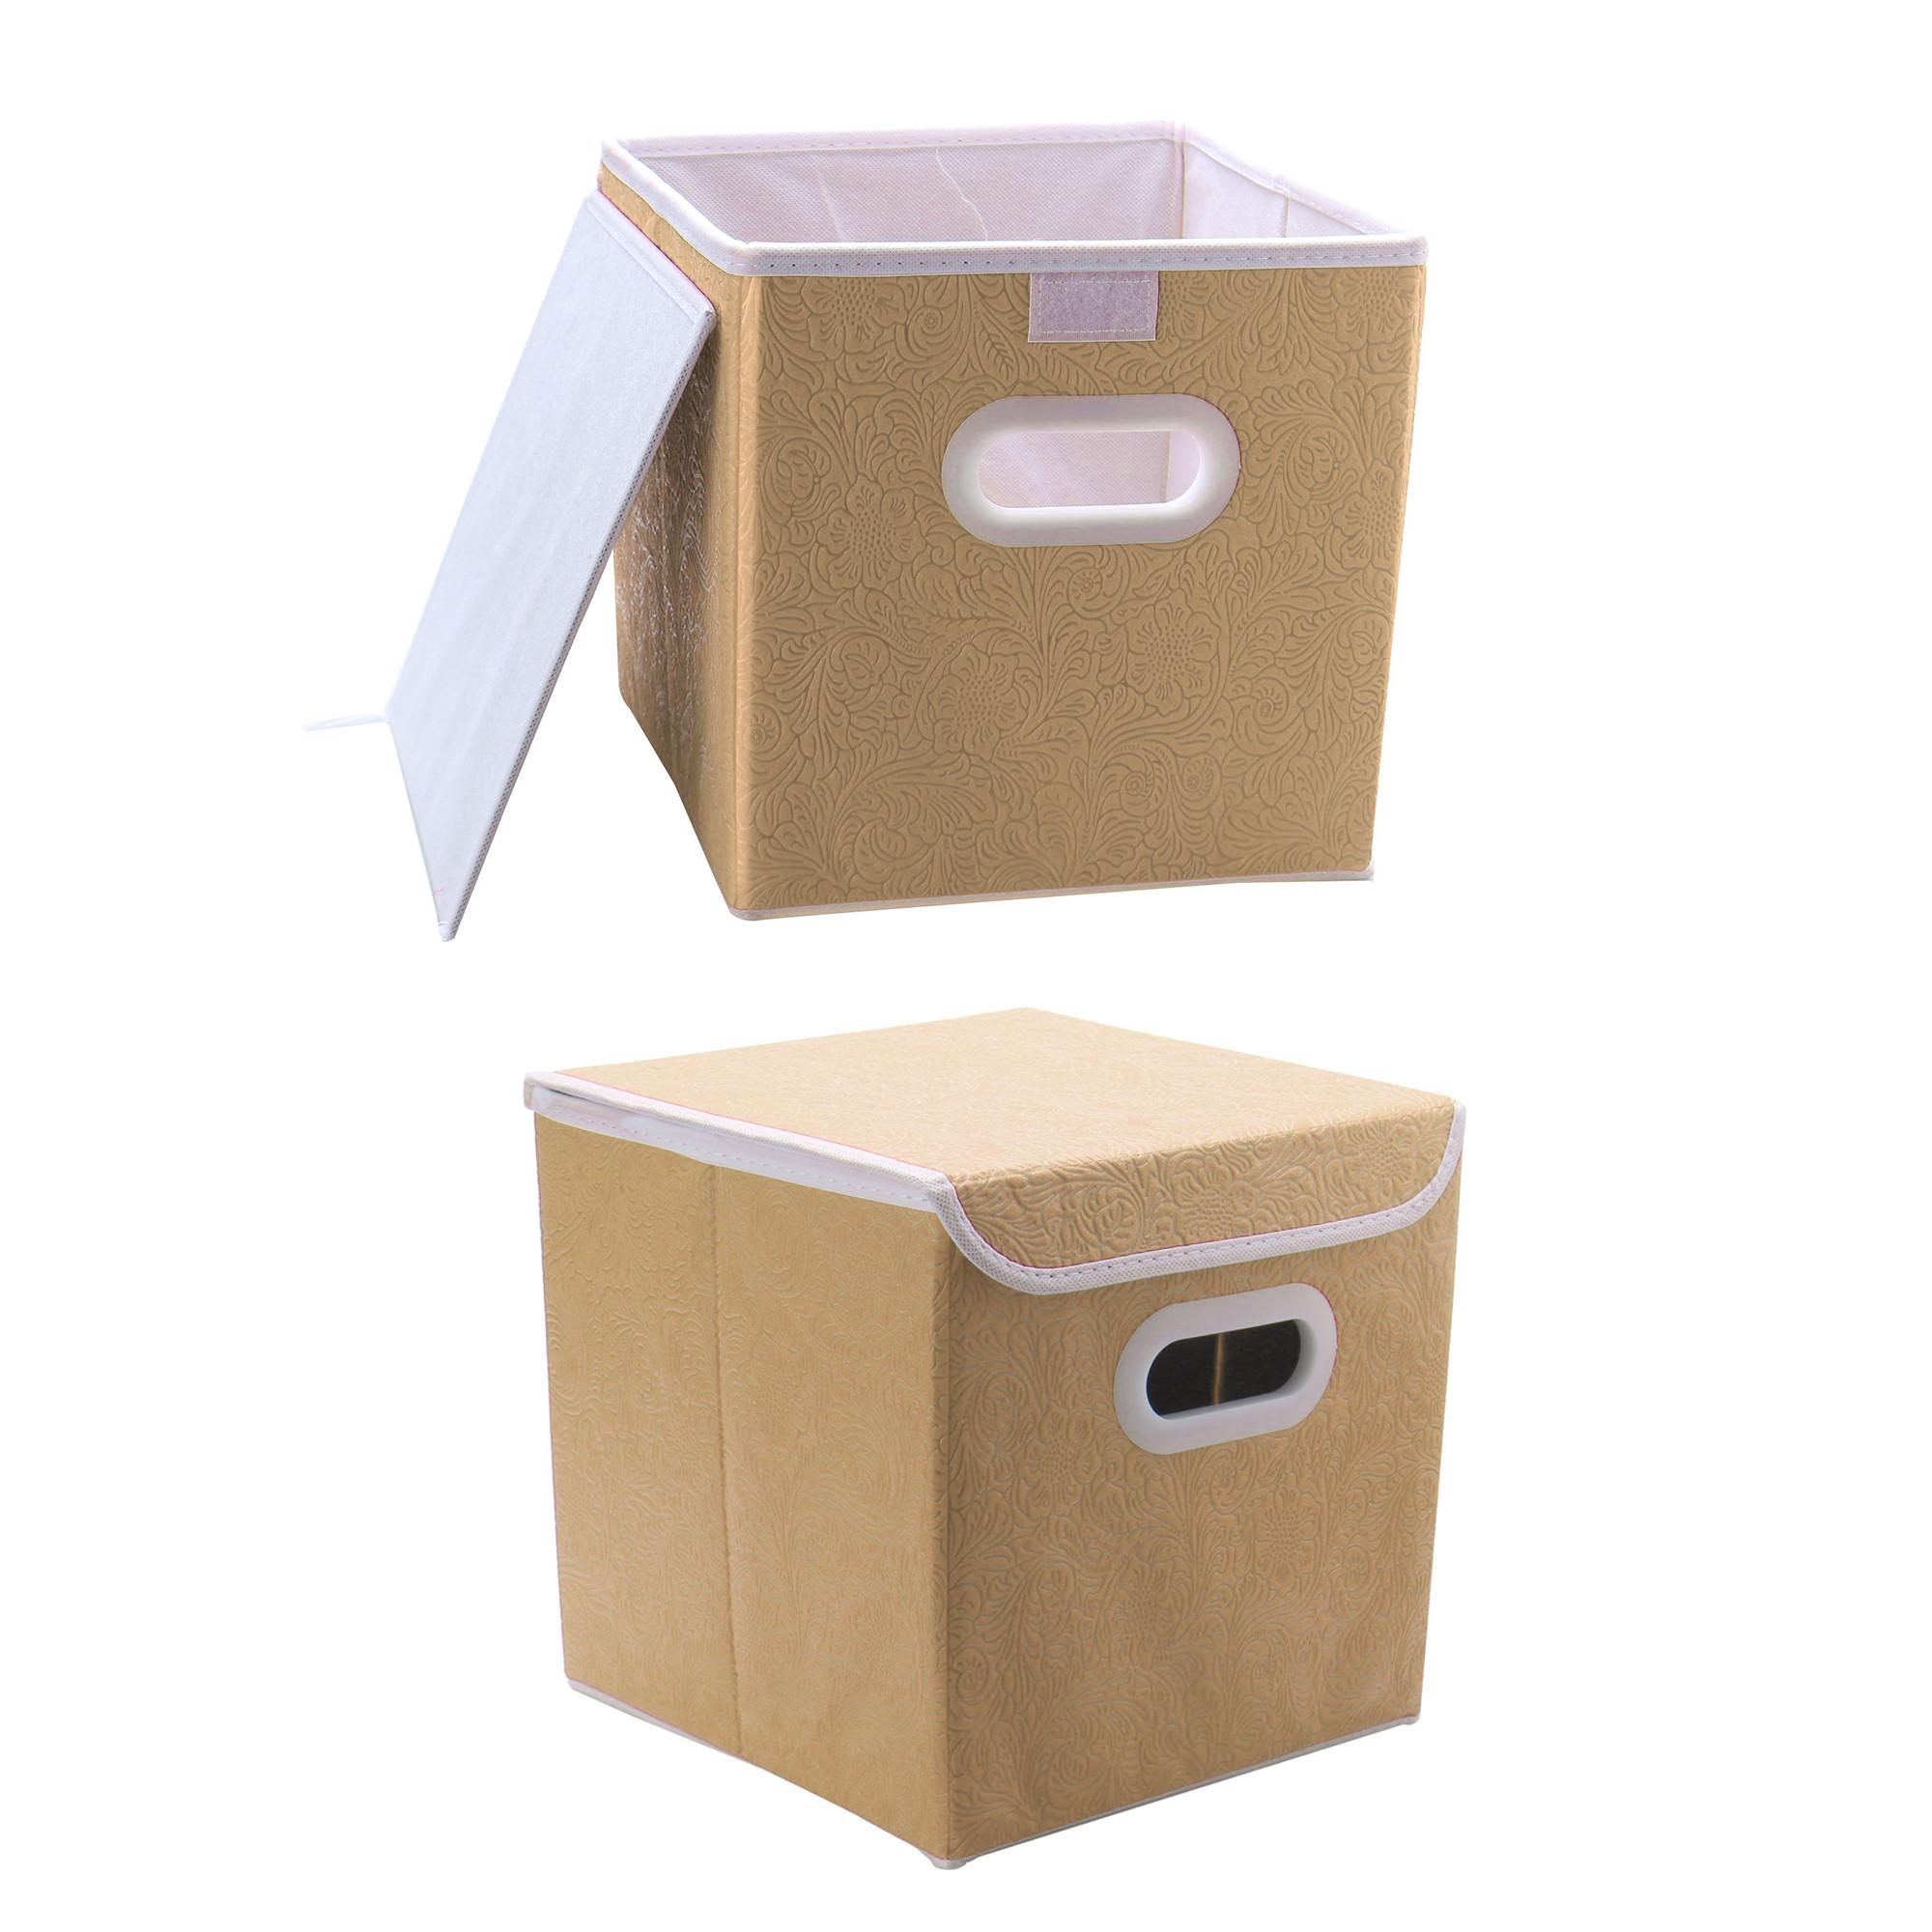 Bedroom Storage Bins  Fabric Storage Bins Cubes Toy Baskets for Bedroom Nursery